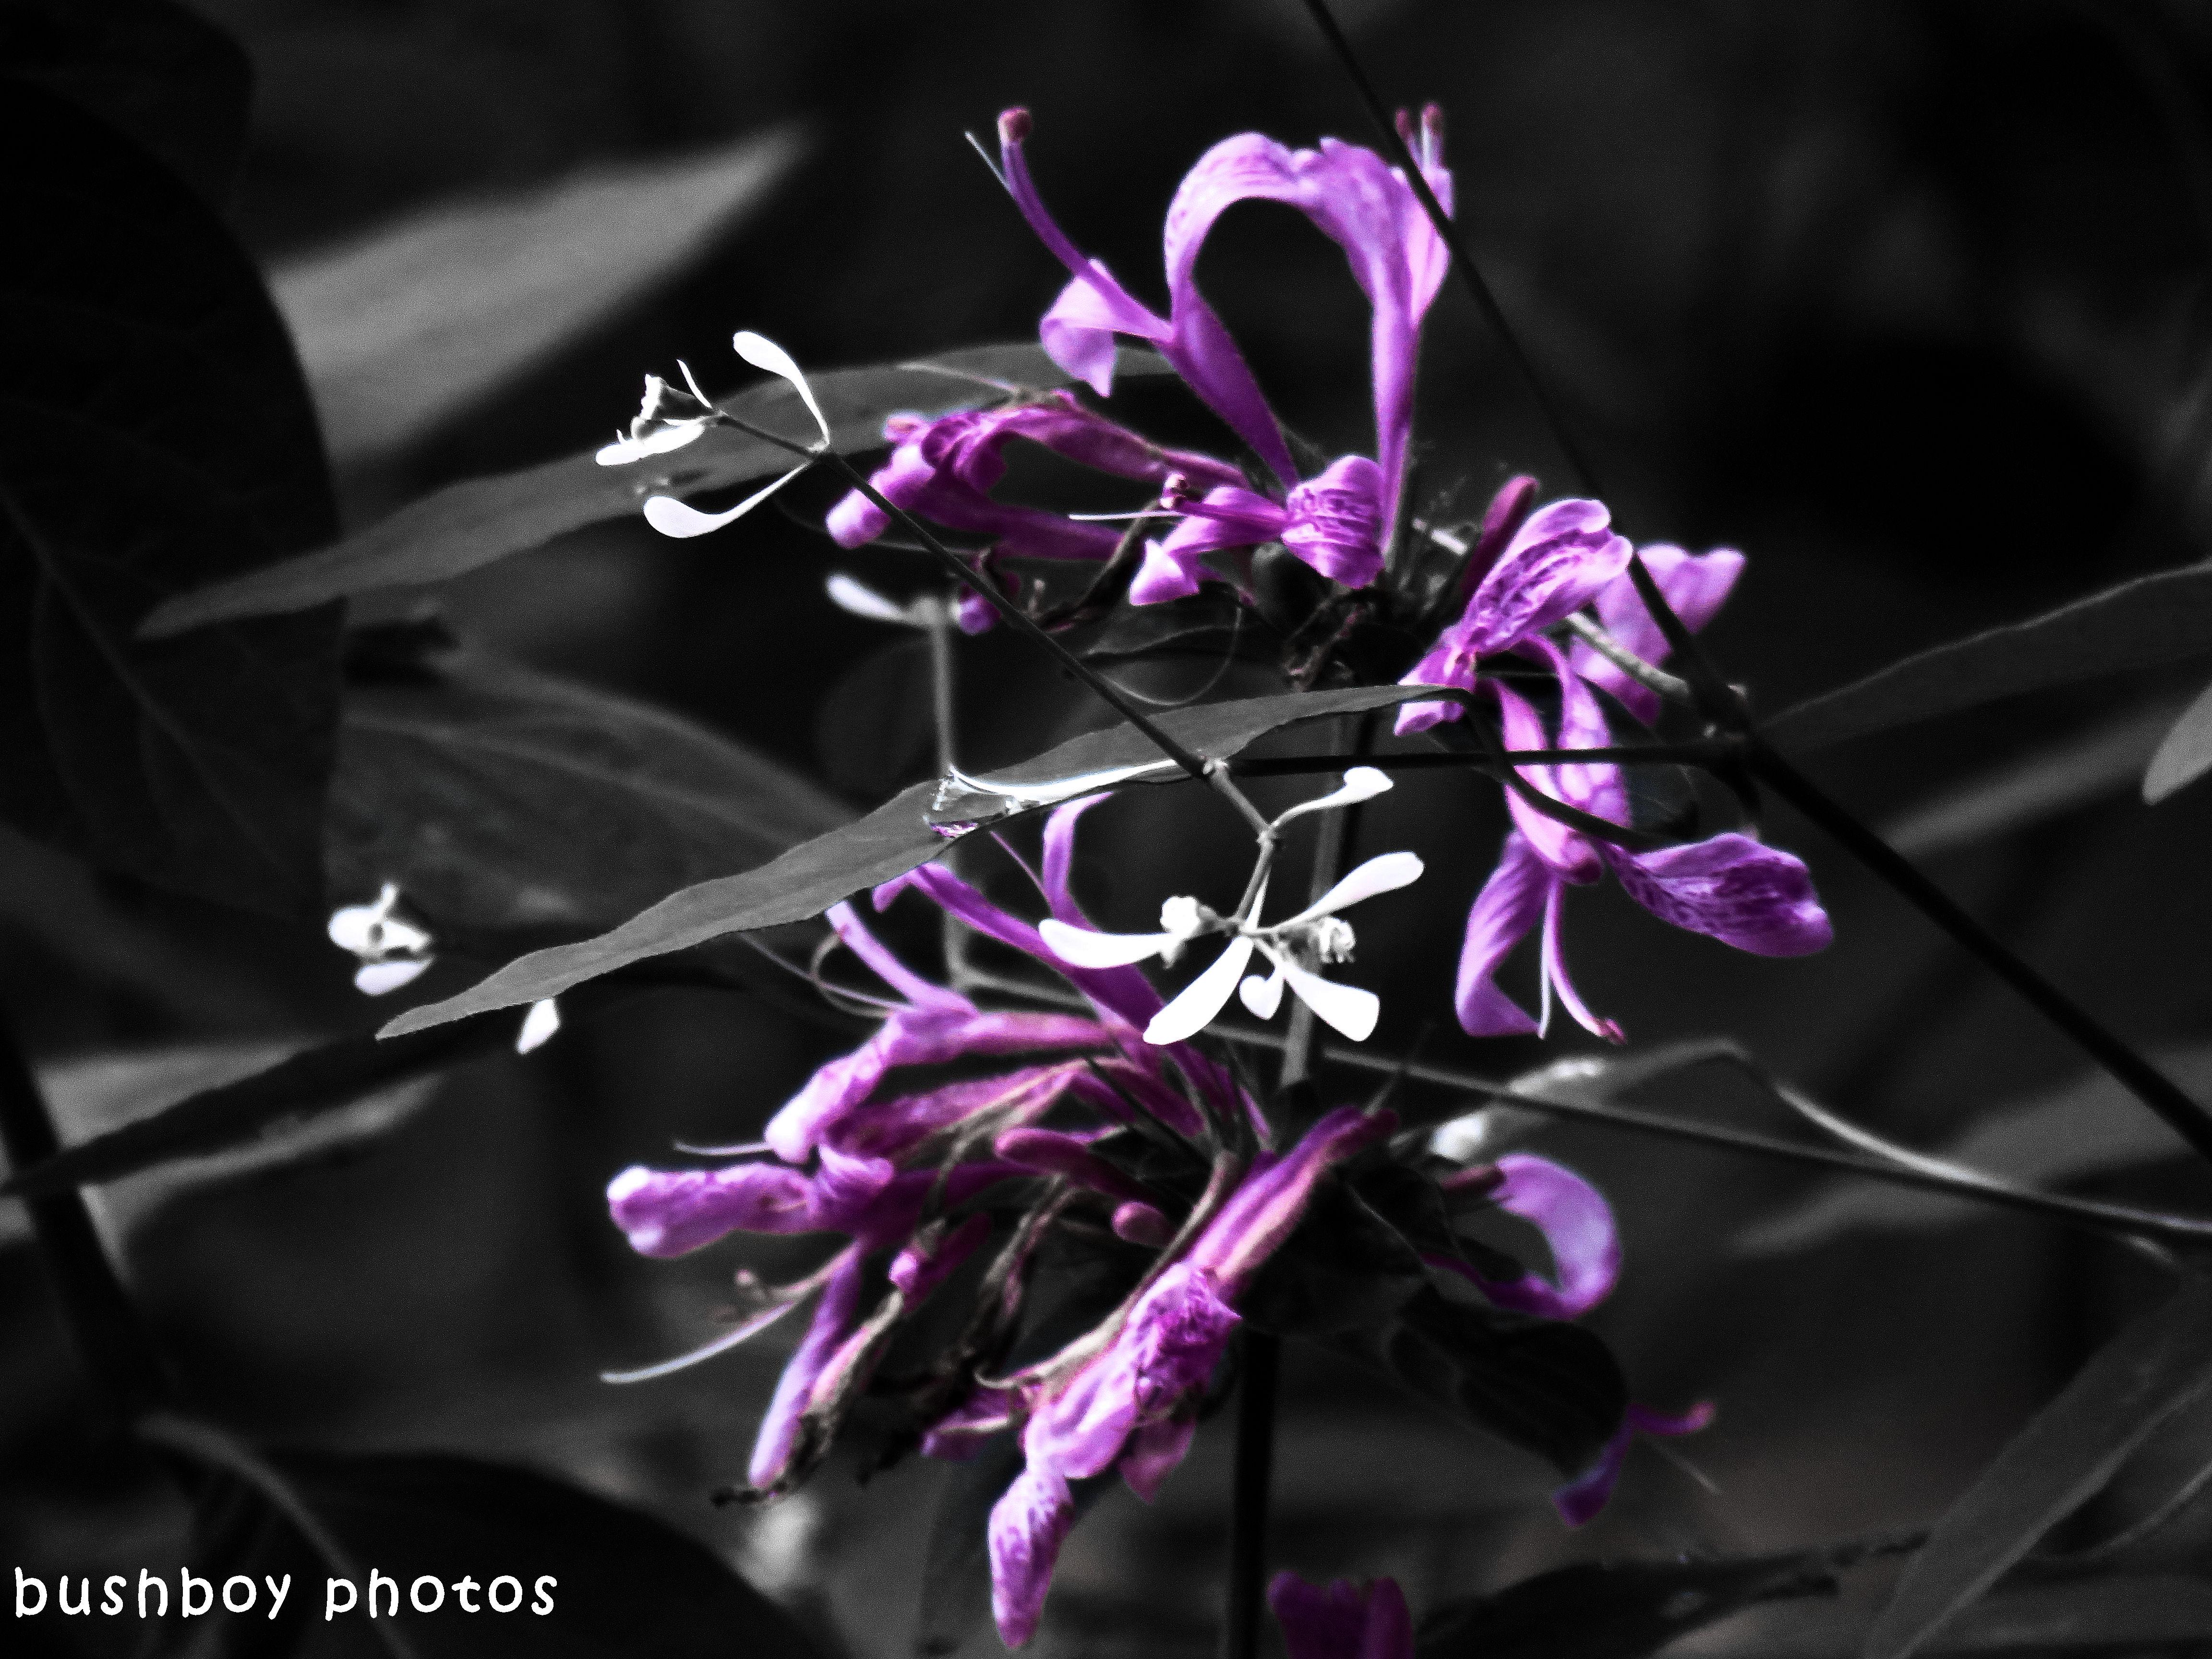 180427_blog challenge_blackandwhite_two differnt things_flowers